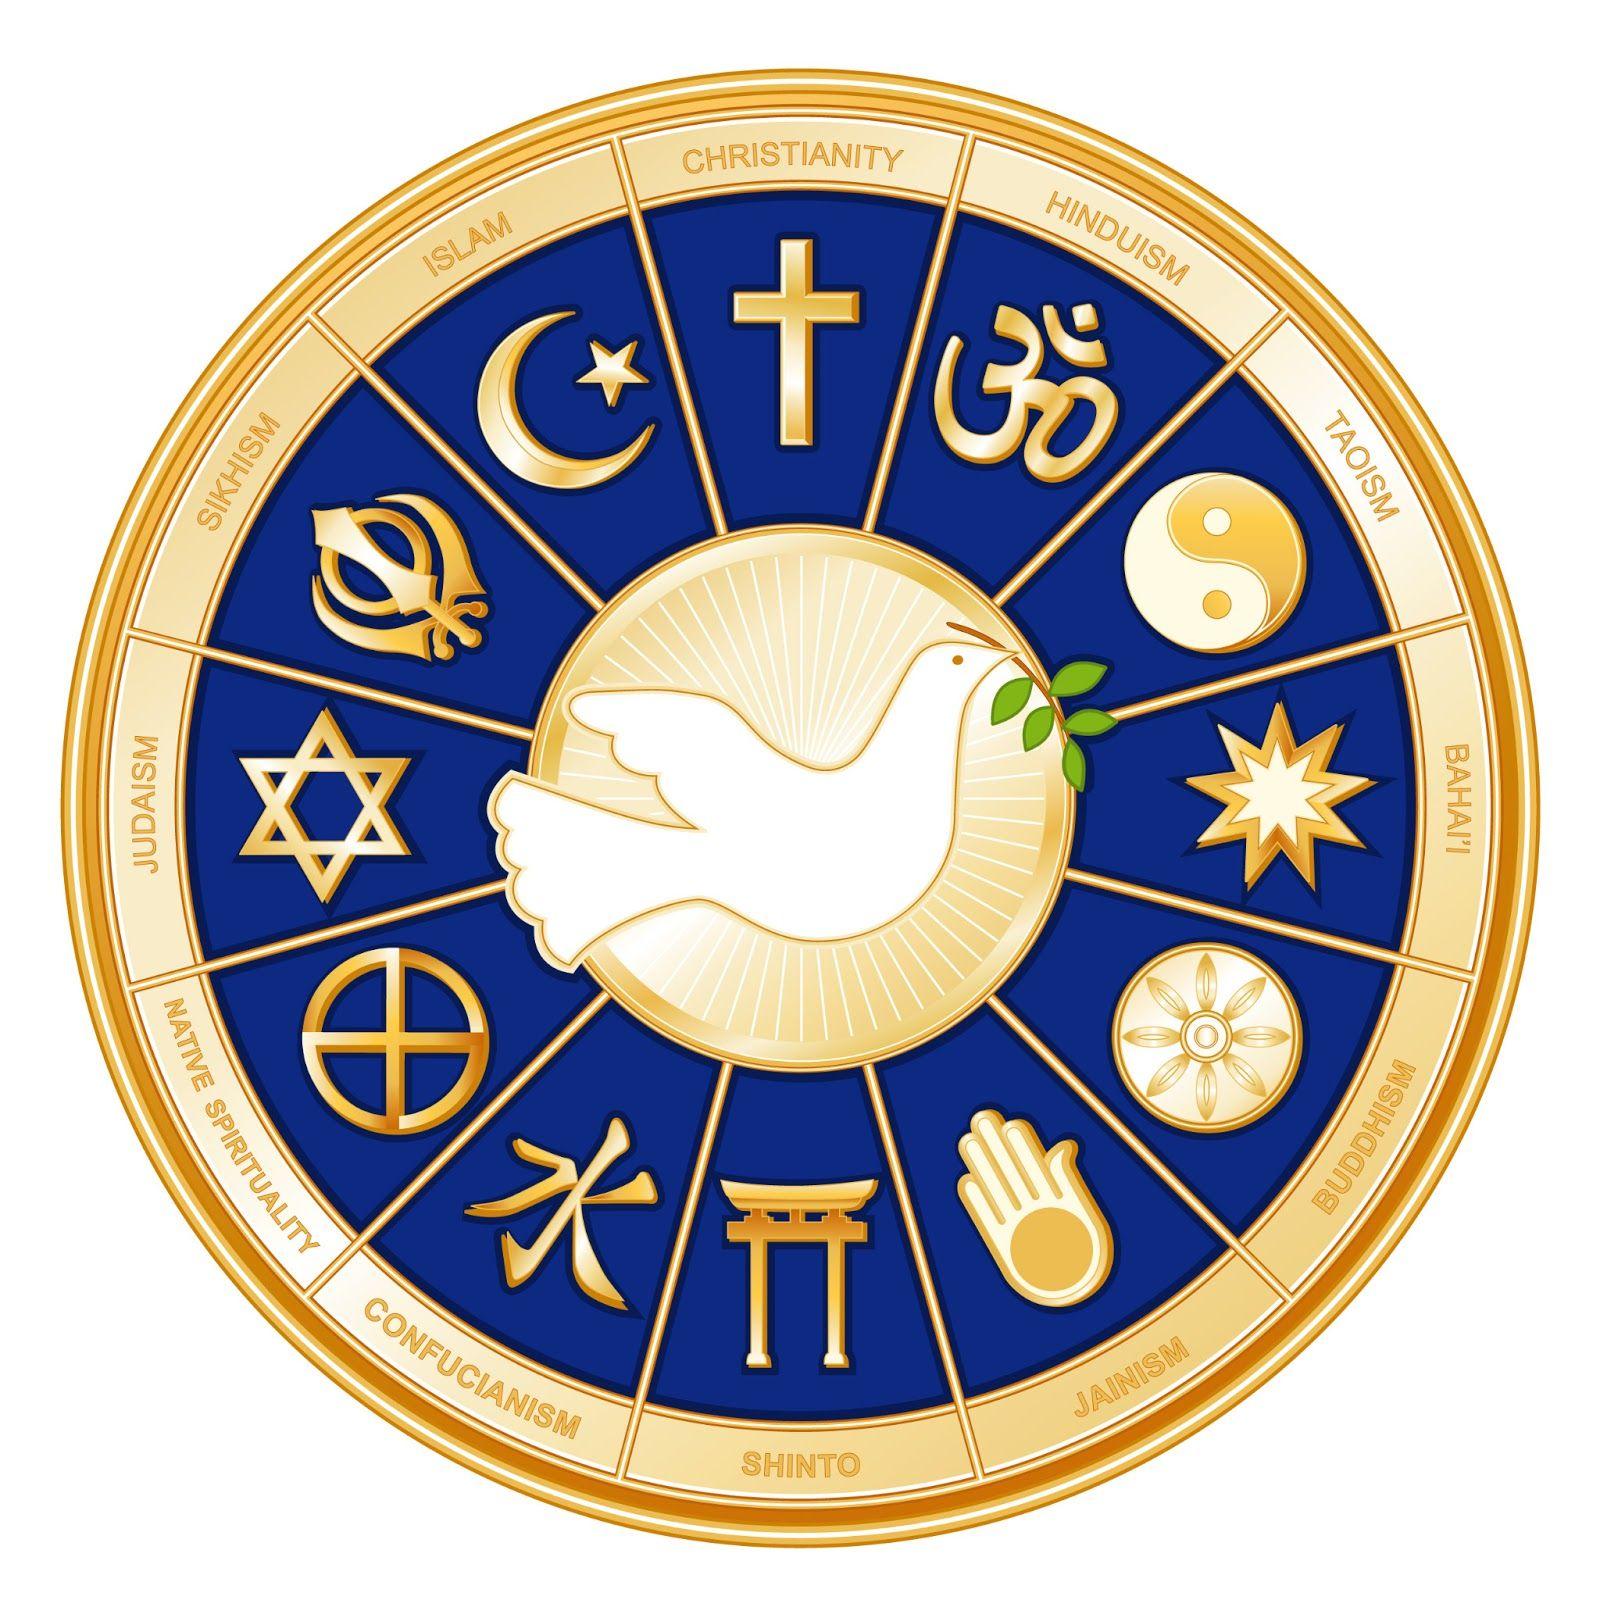 Progressive judaism and interfaith dialogue interfaith symbols illustration of world religions international peace symbol islam christianity vector art clipart and stock vectors biocorpaavc